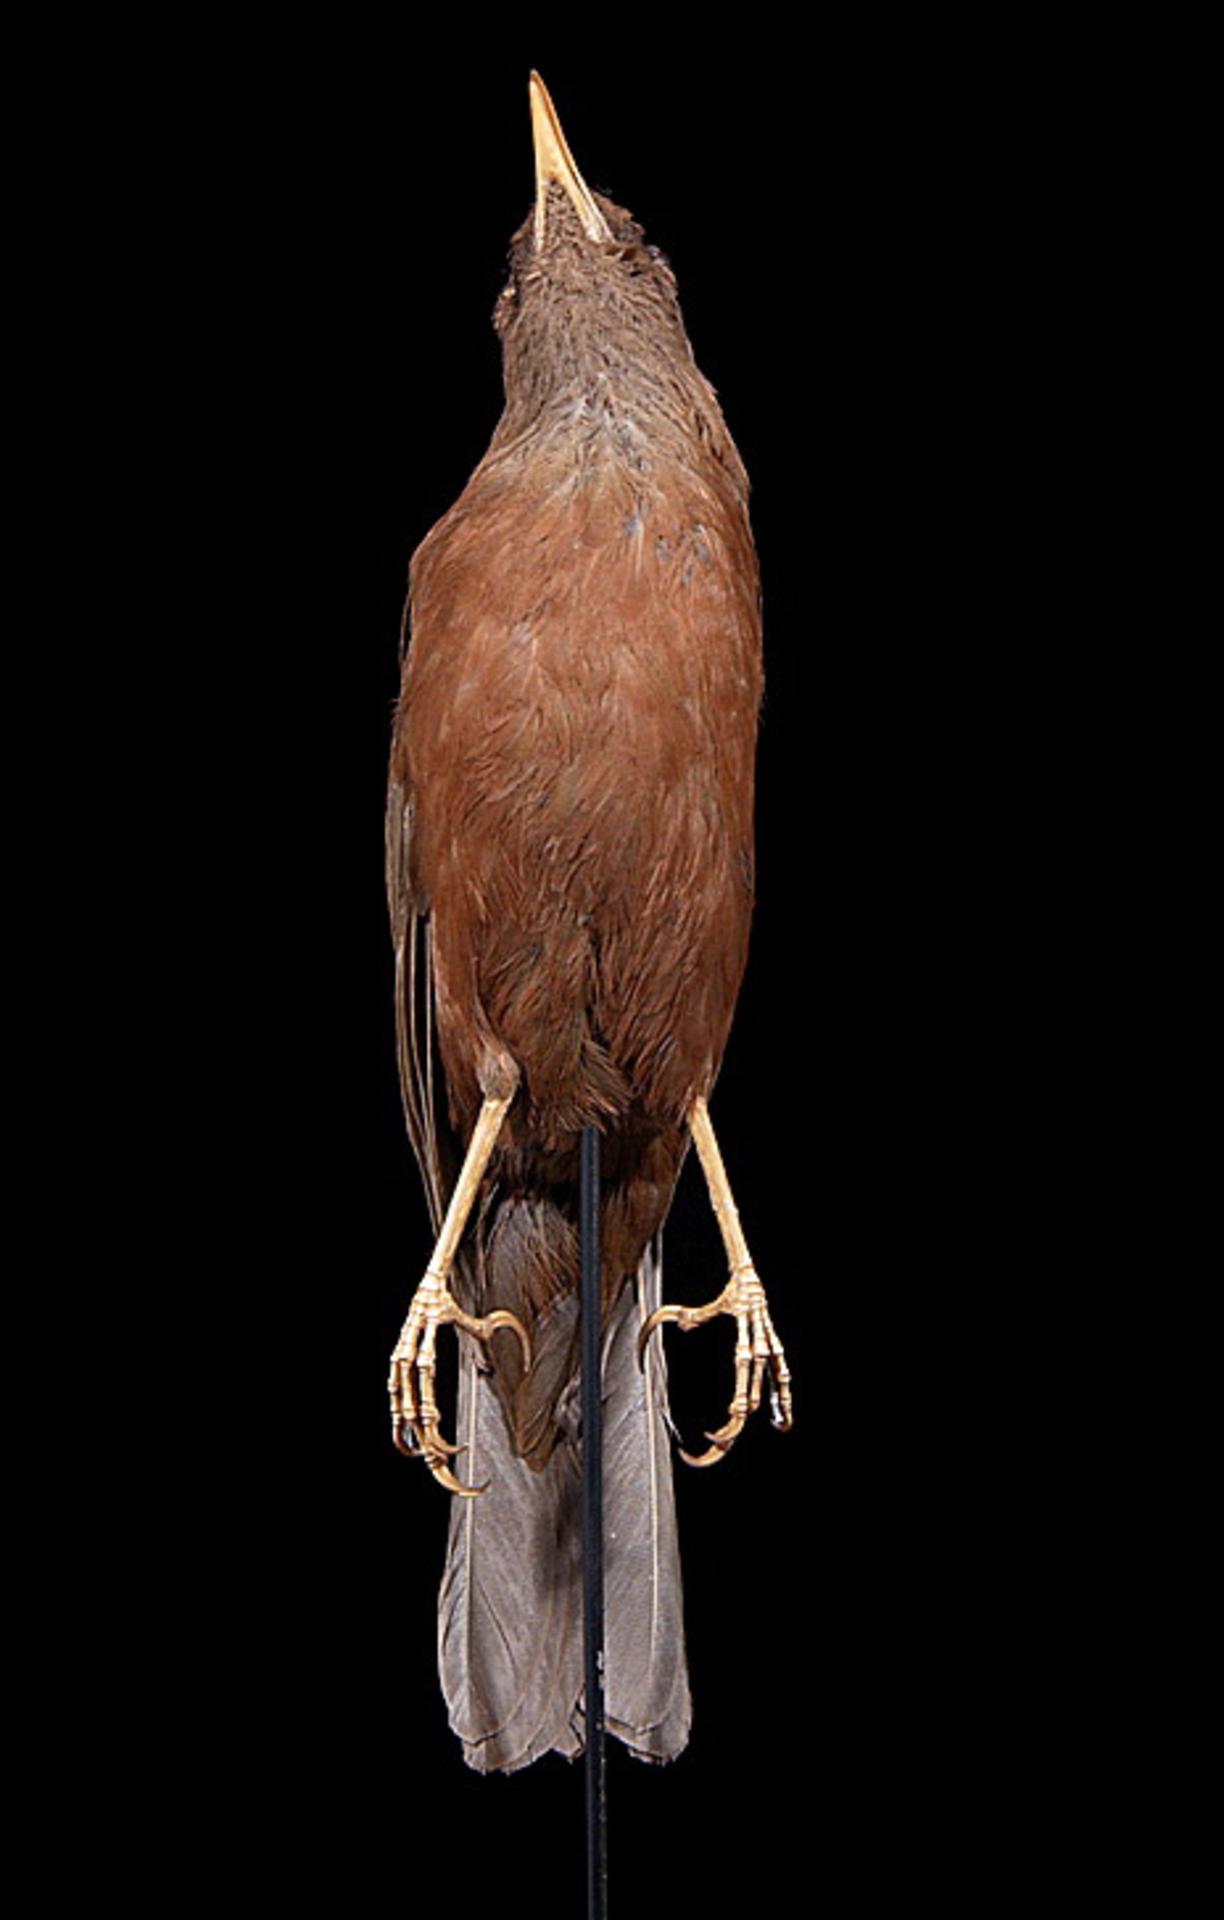 RMNH.AVES.110036 | Turdus poliocephalus vinitinctus (Gould, 1855)